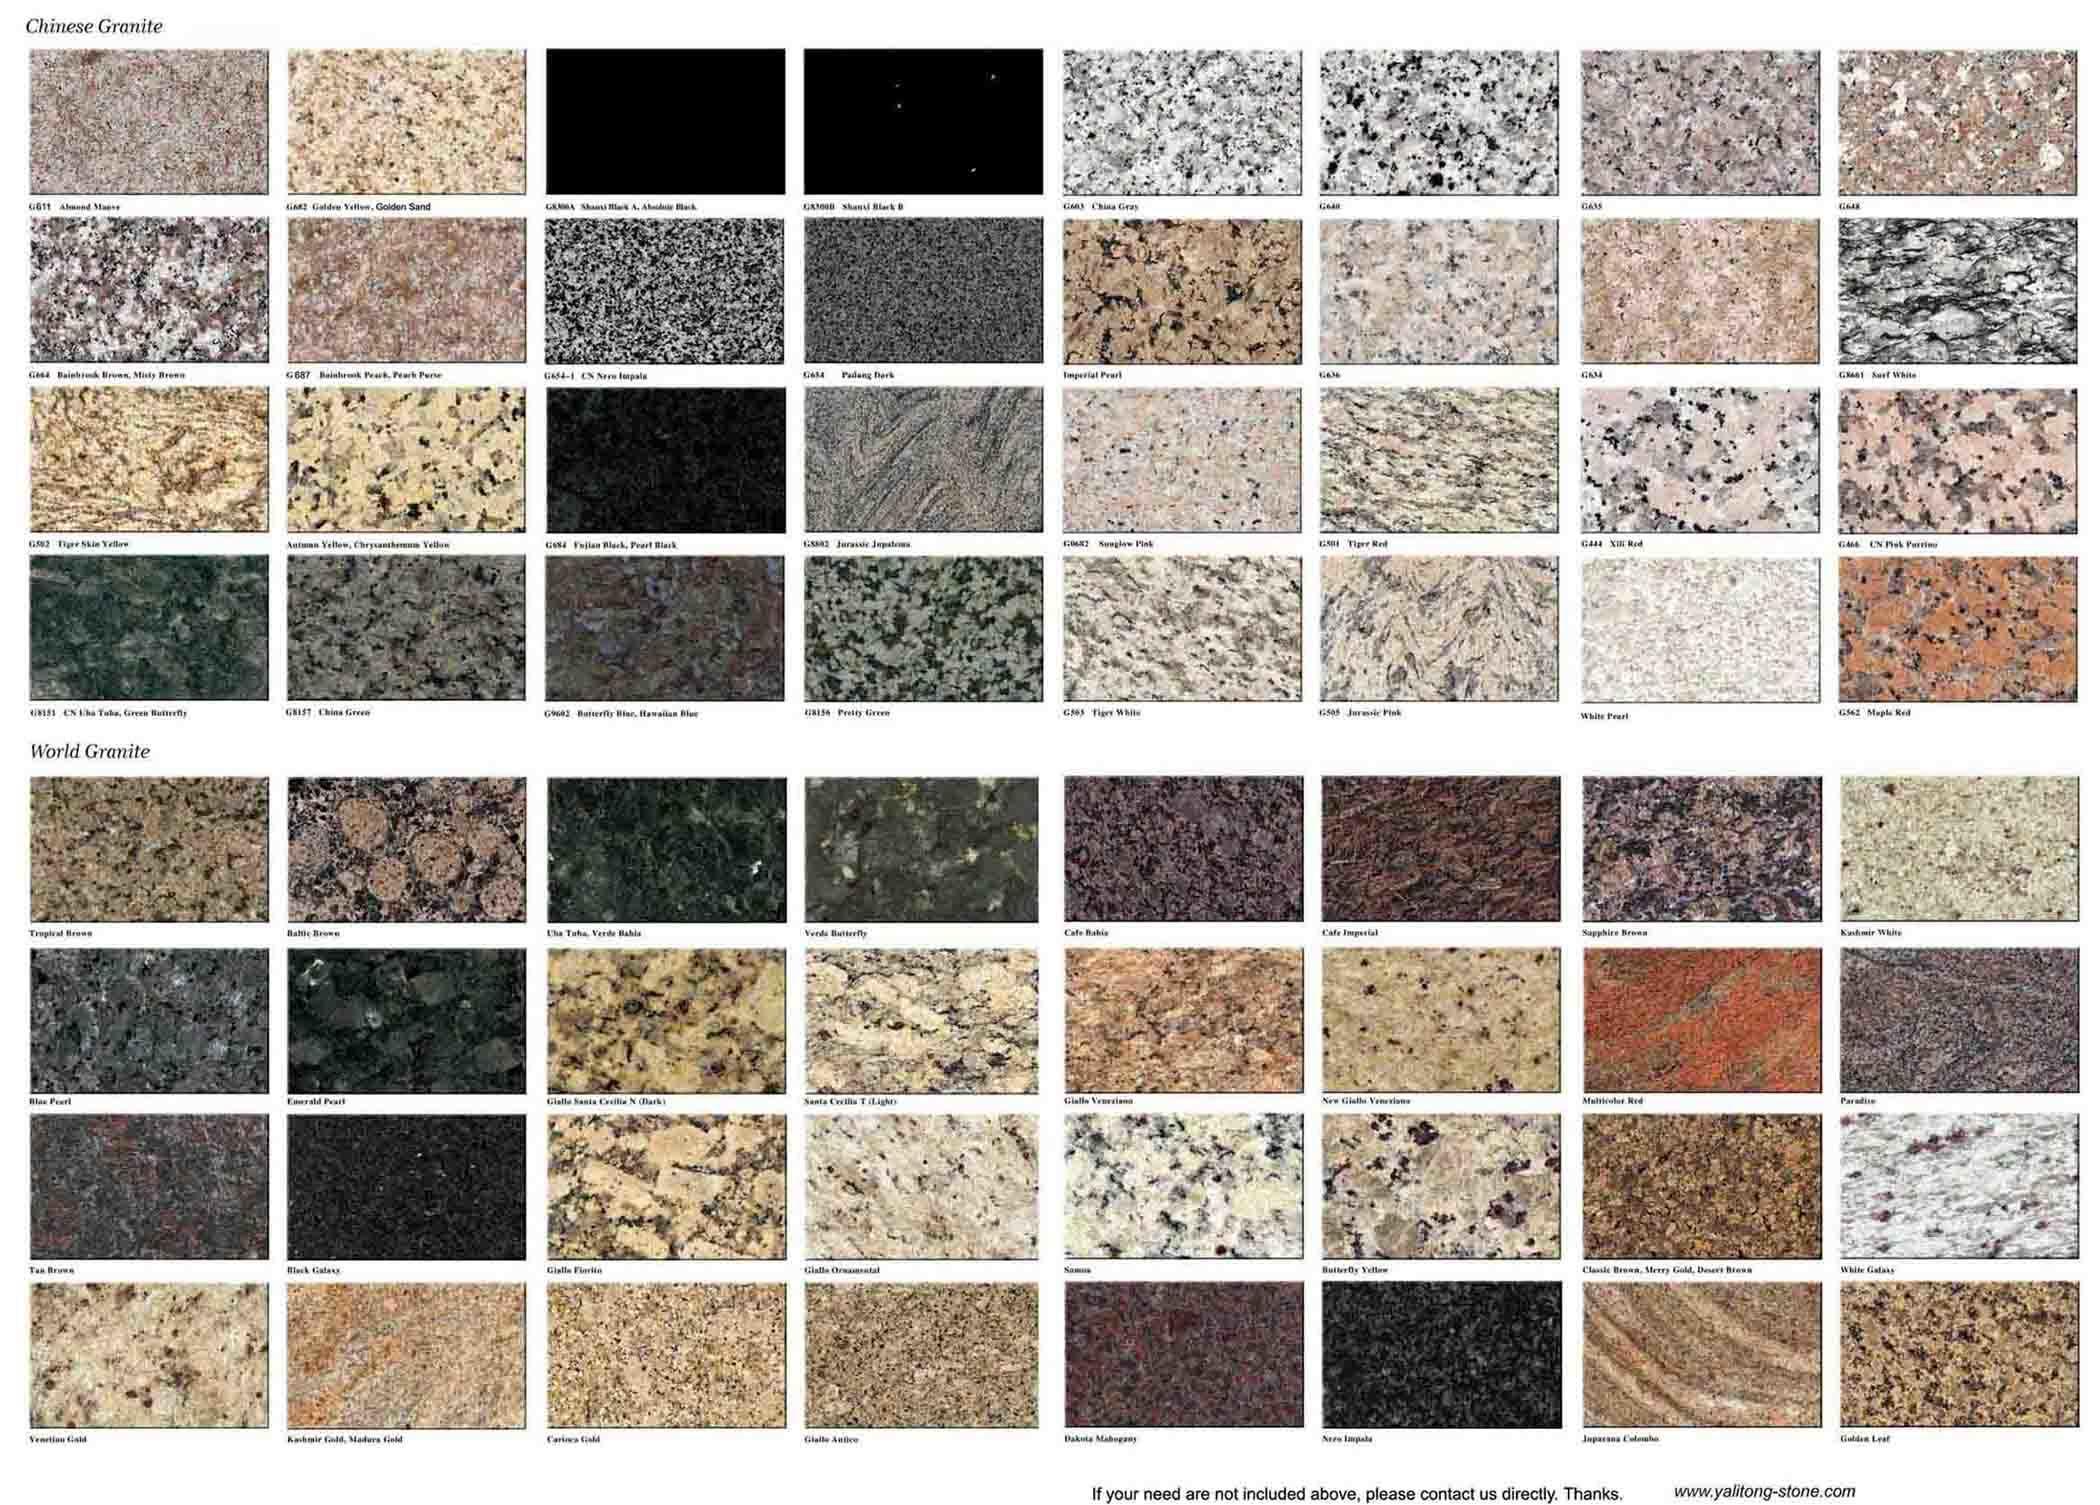 China Granite and Marble Tiles - China Granite, Marble